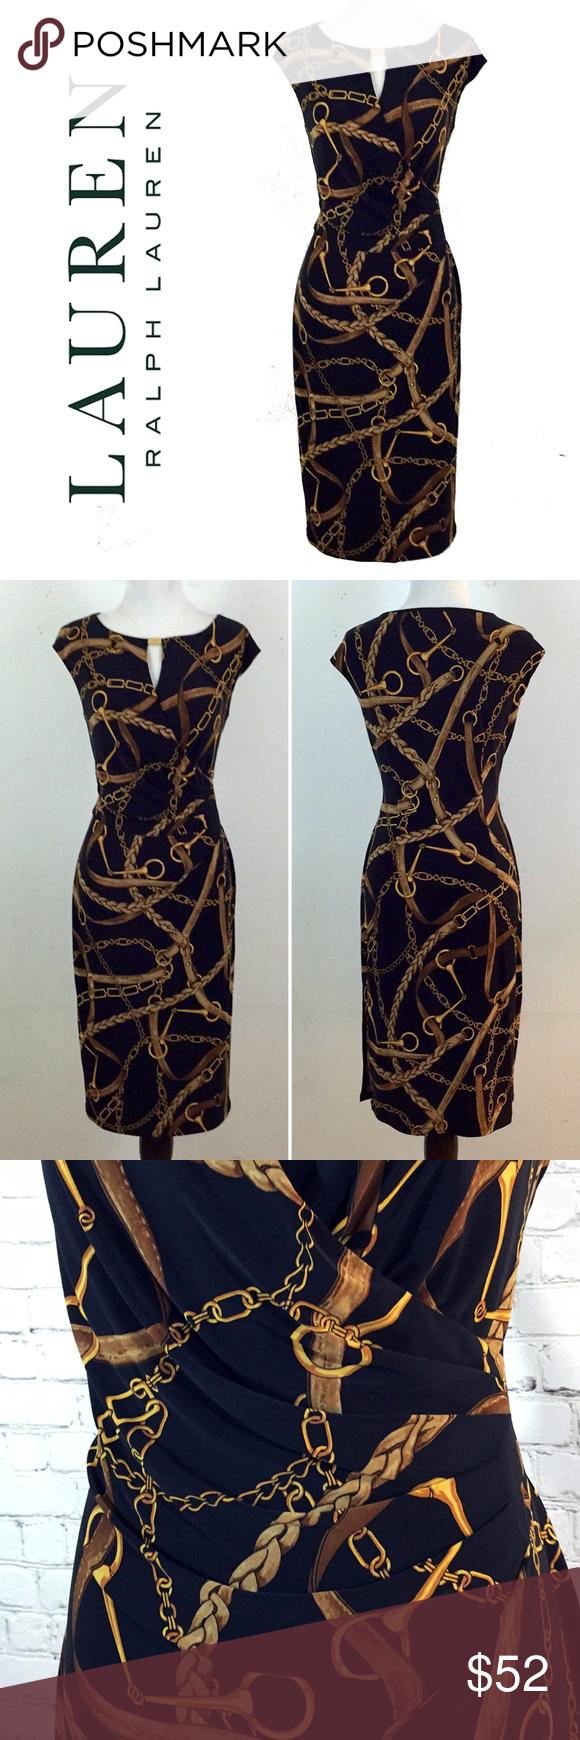 Ralph Lauren Black Gold Chain Print Keyhole Dress Keyhole Dress Black Gold Chain Dresses [ 1740 x 580 Pixel ]